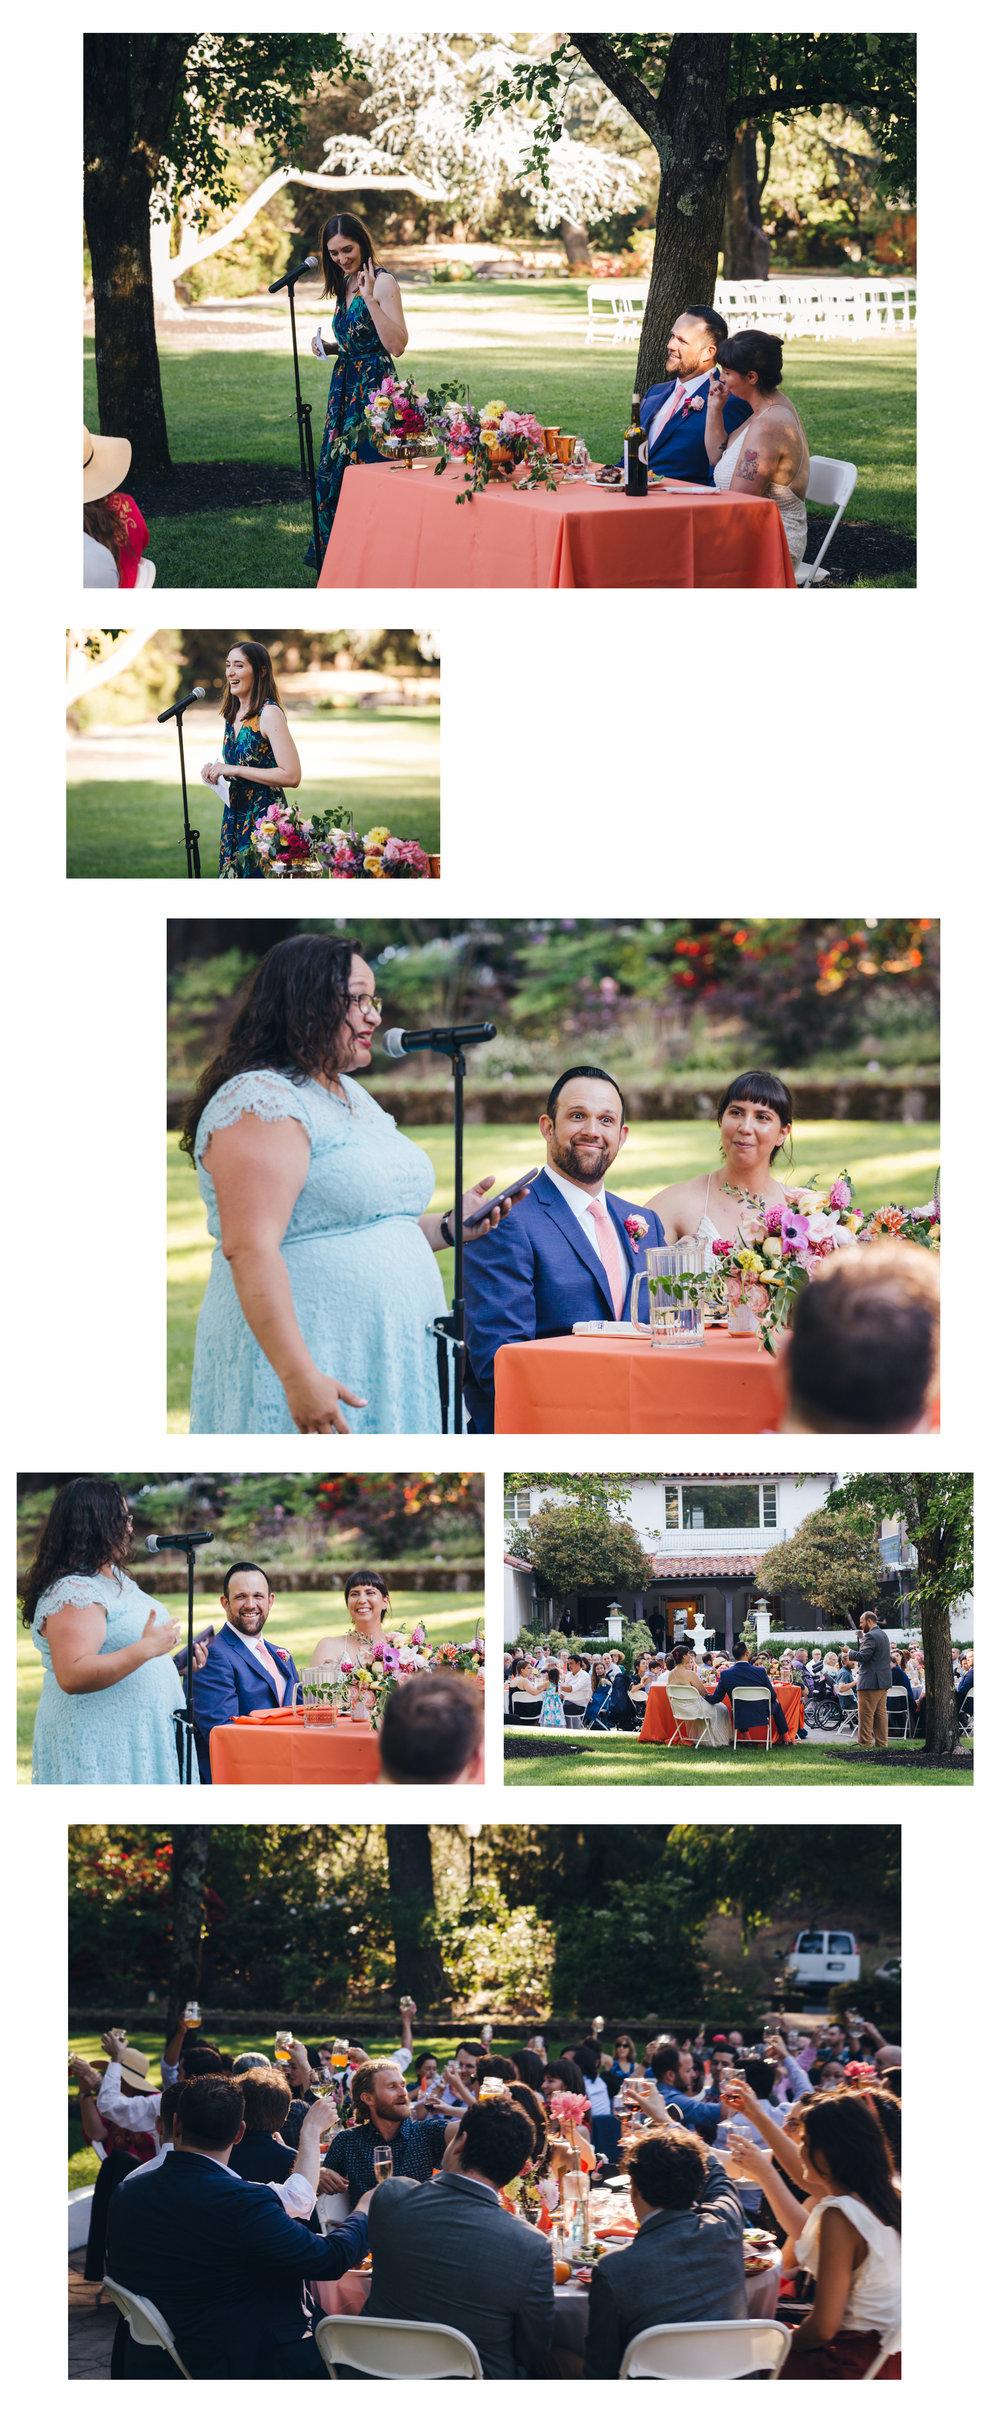 IG_wedding (52 of 110) copy.jpg